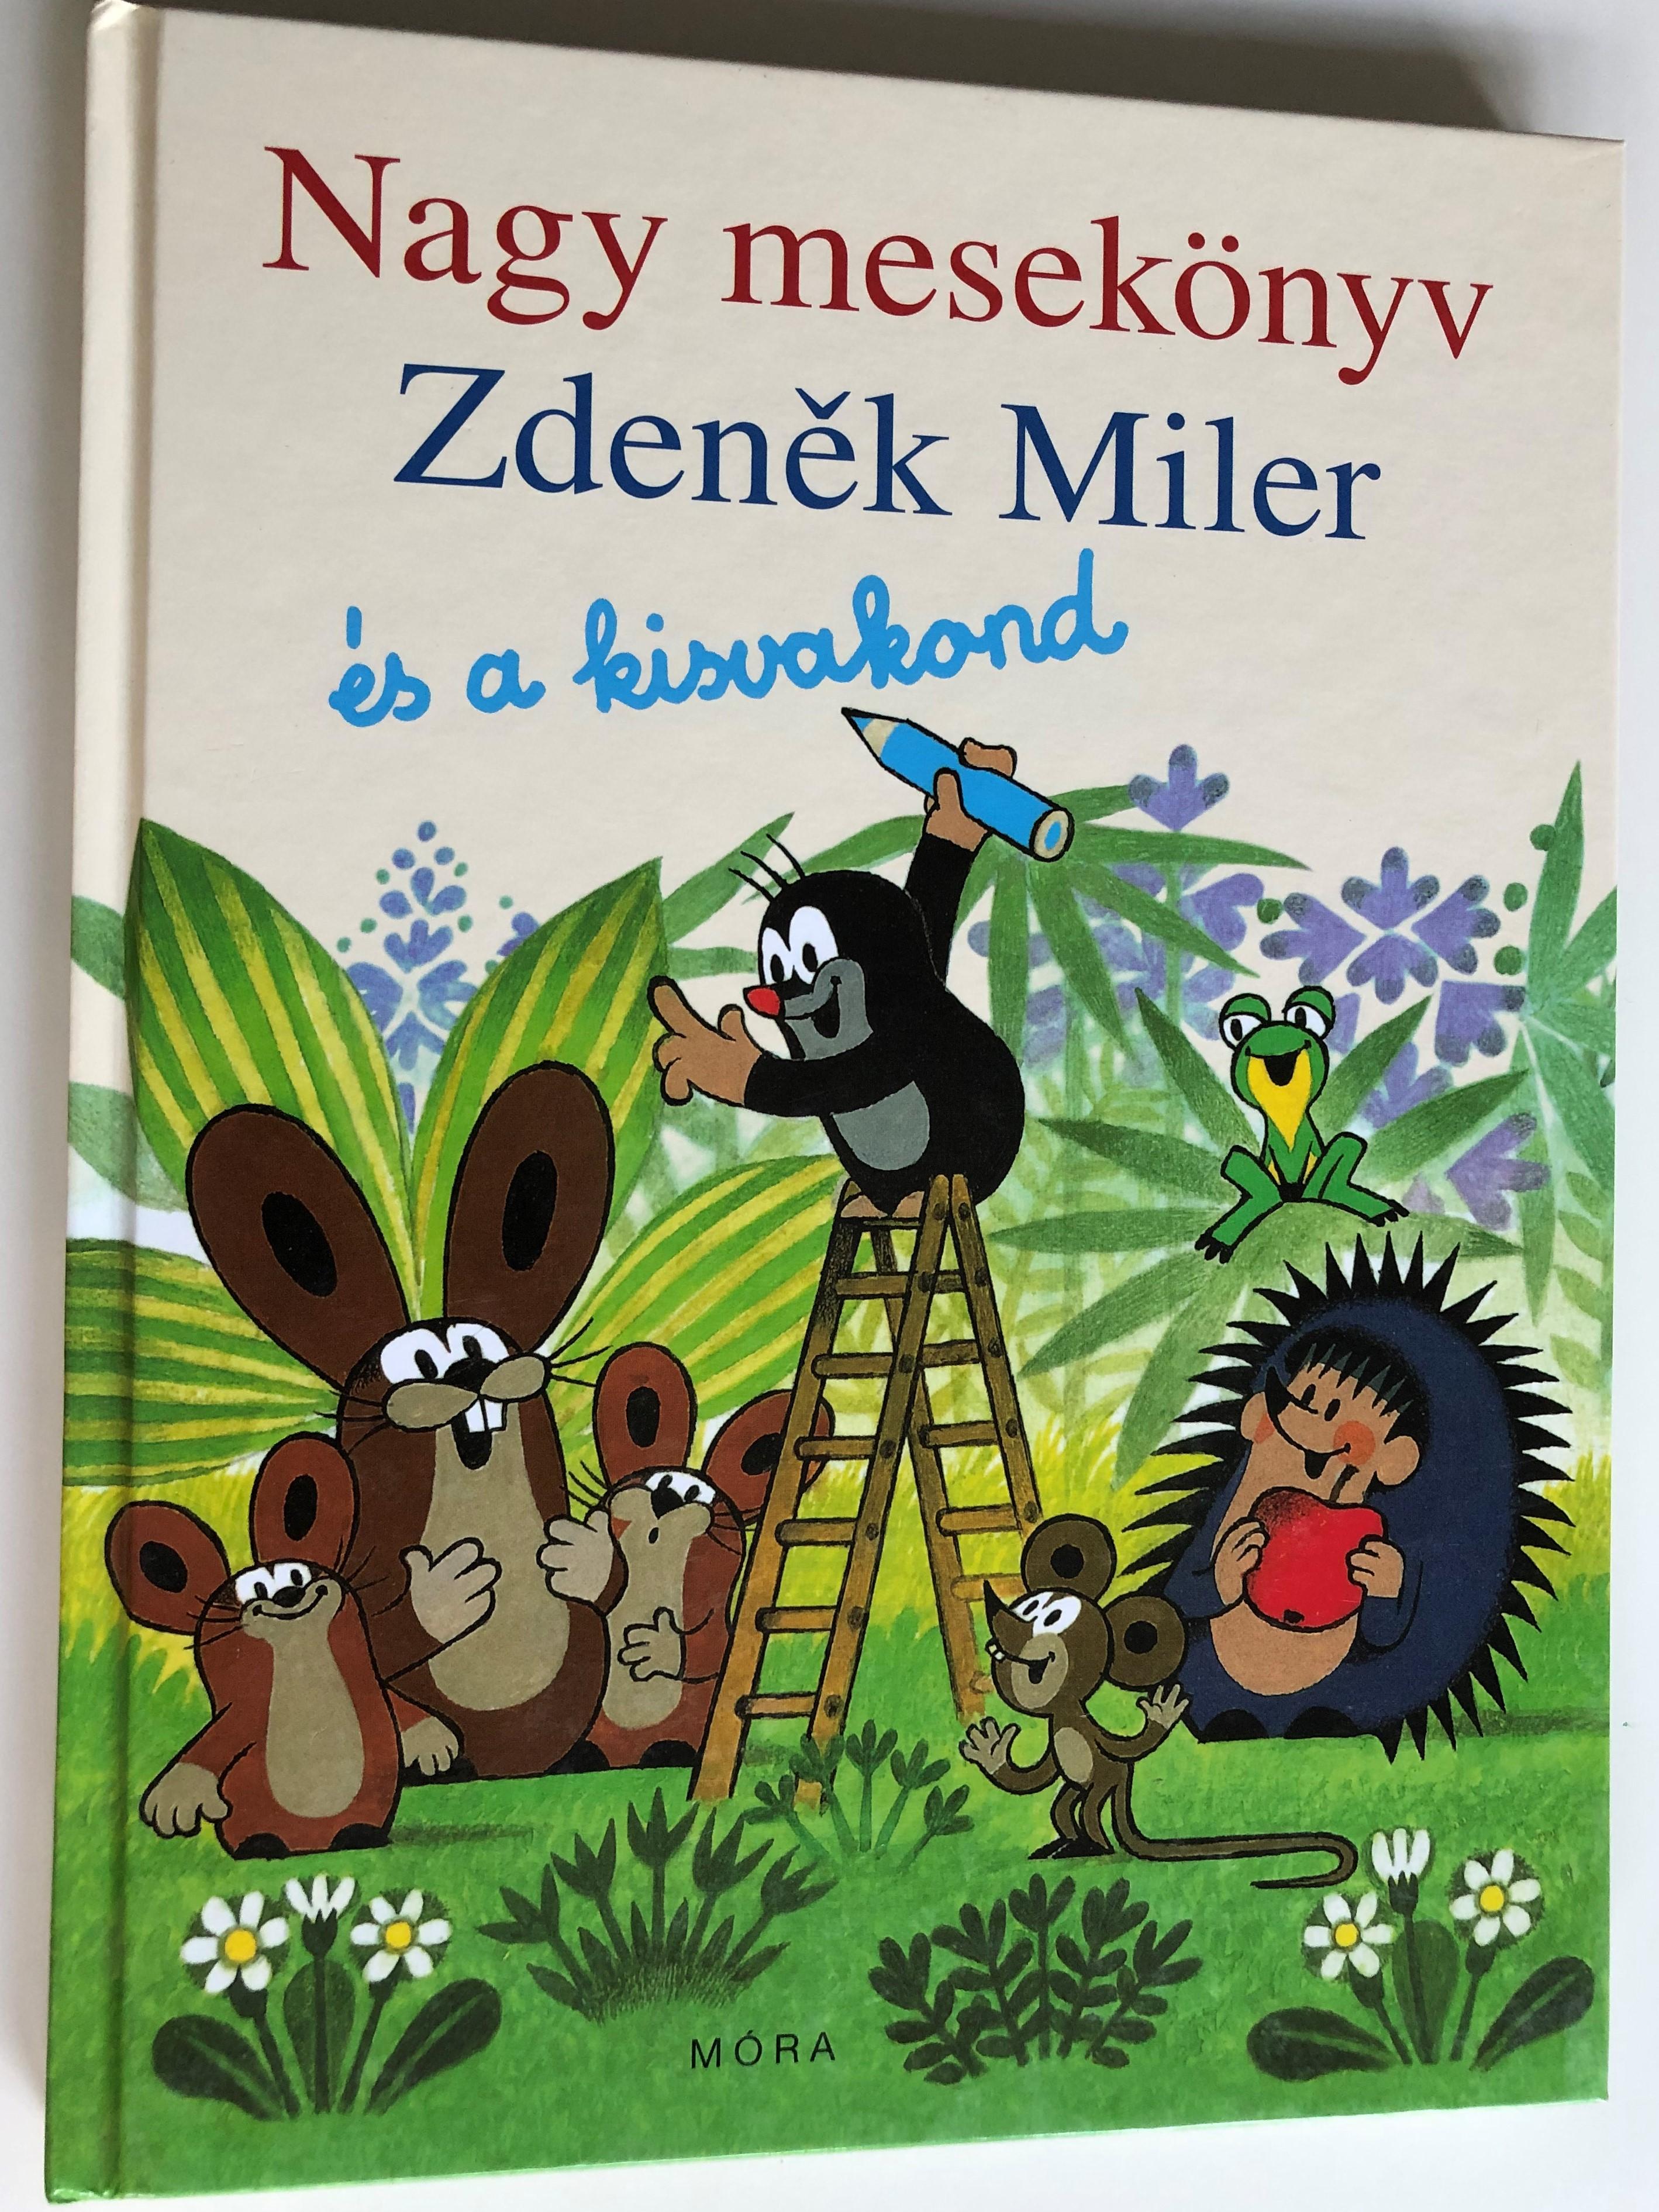 nagy-mesek-nyv-zdenek-miler-s-a-kisvakond-hungarian-translation-of-d-tem-big-story-book-zdenek-miler-and-krtek-little-mole-m-ra-k-nyvkiad-2009-1-.jpg